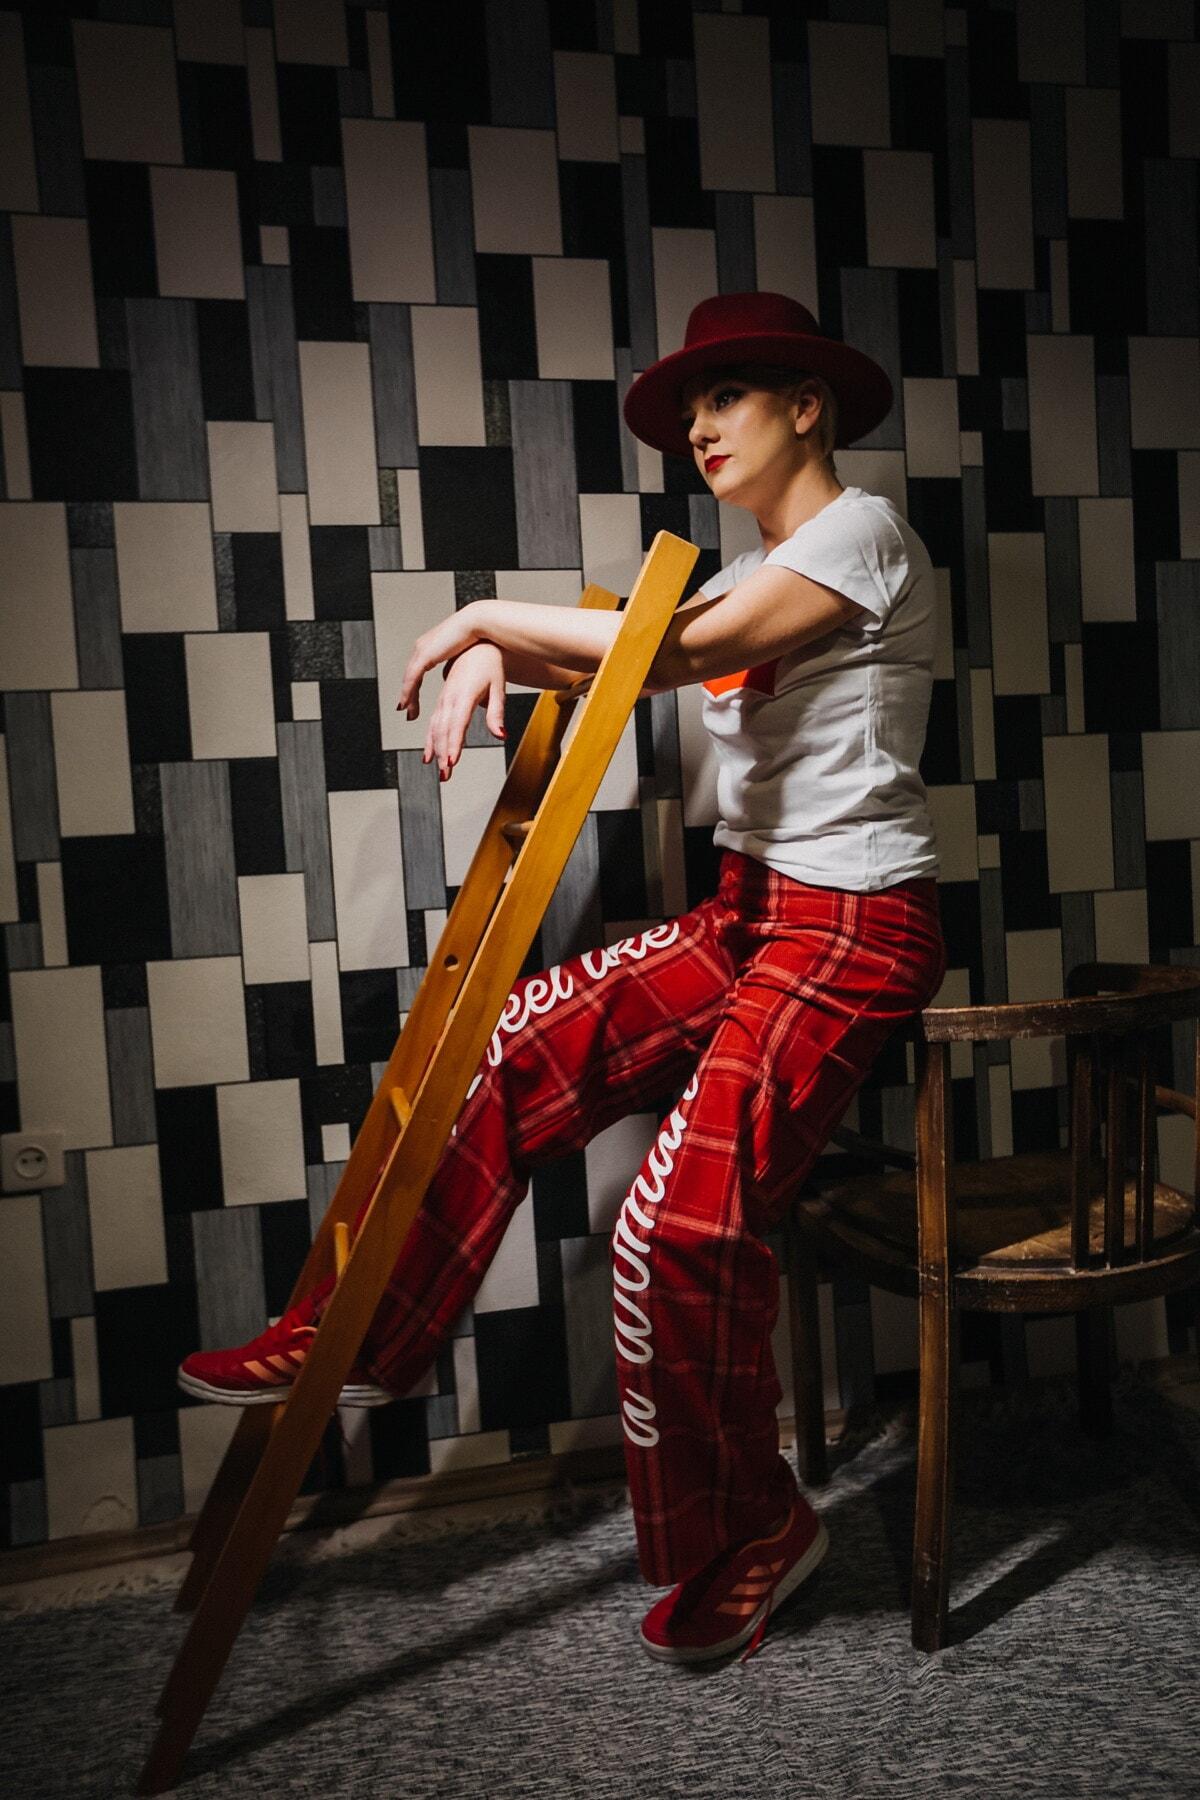 red, hat, photo studio, photo model, fashion, posing, pants, free style, people, woman